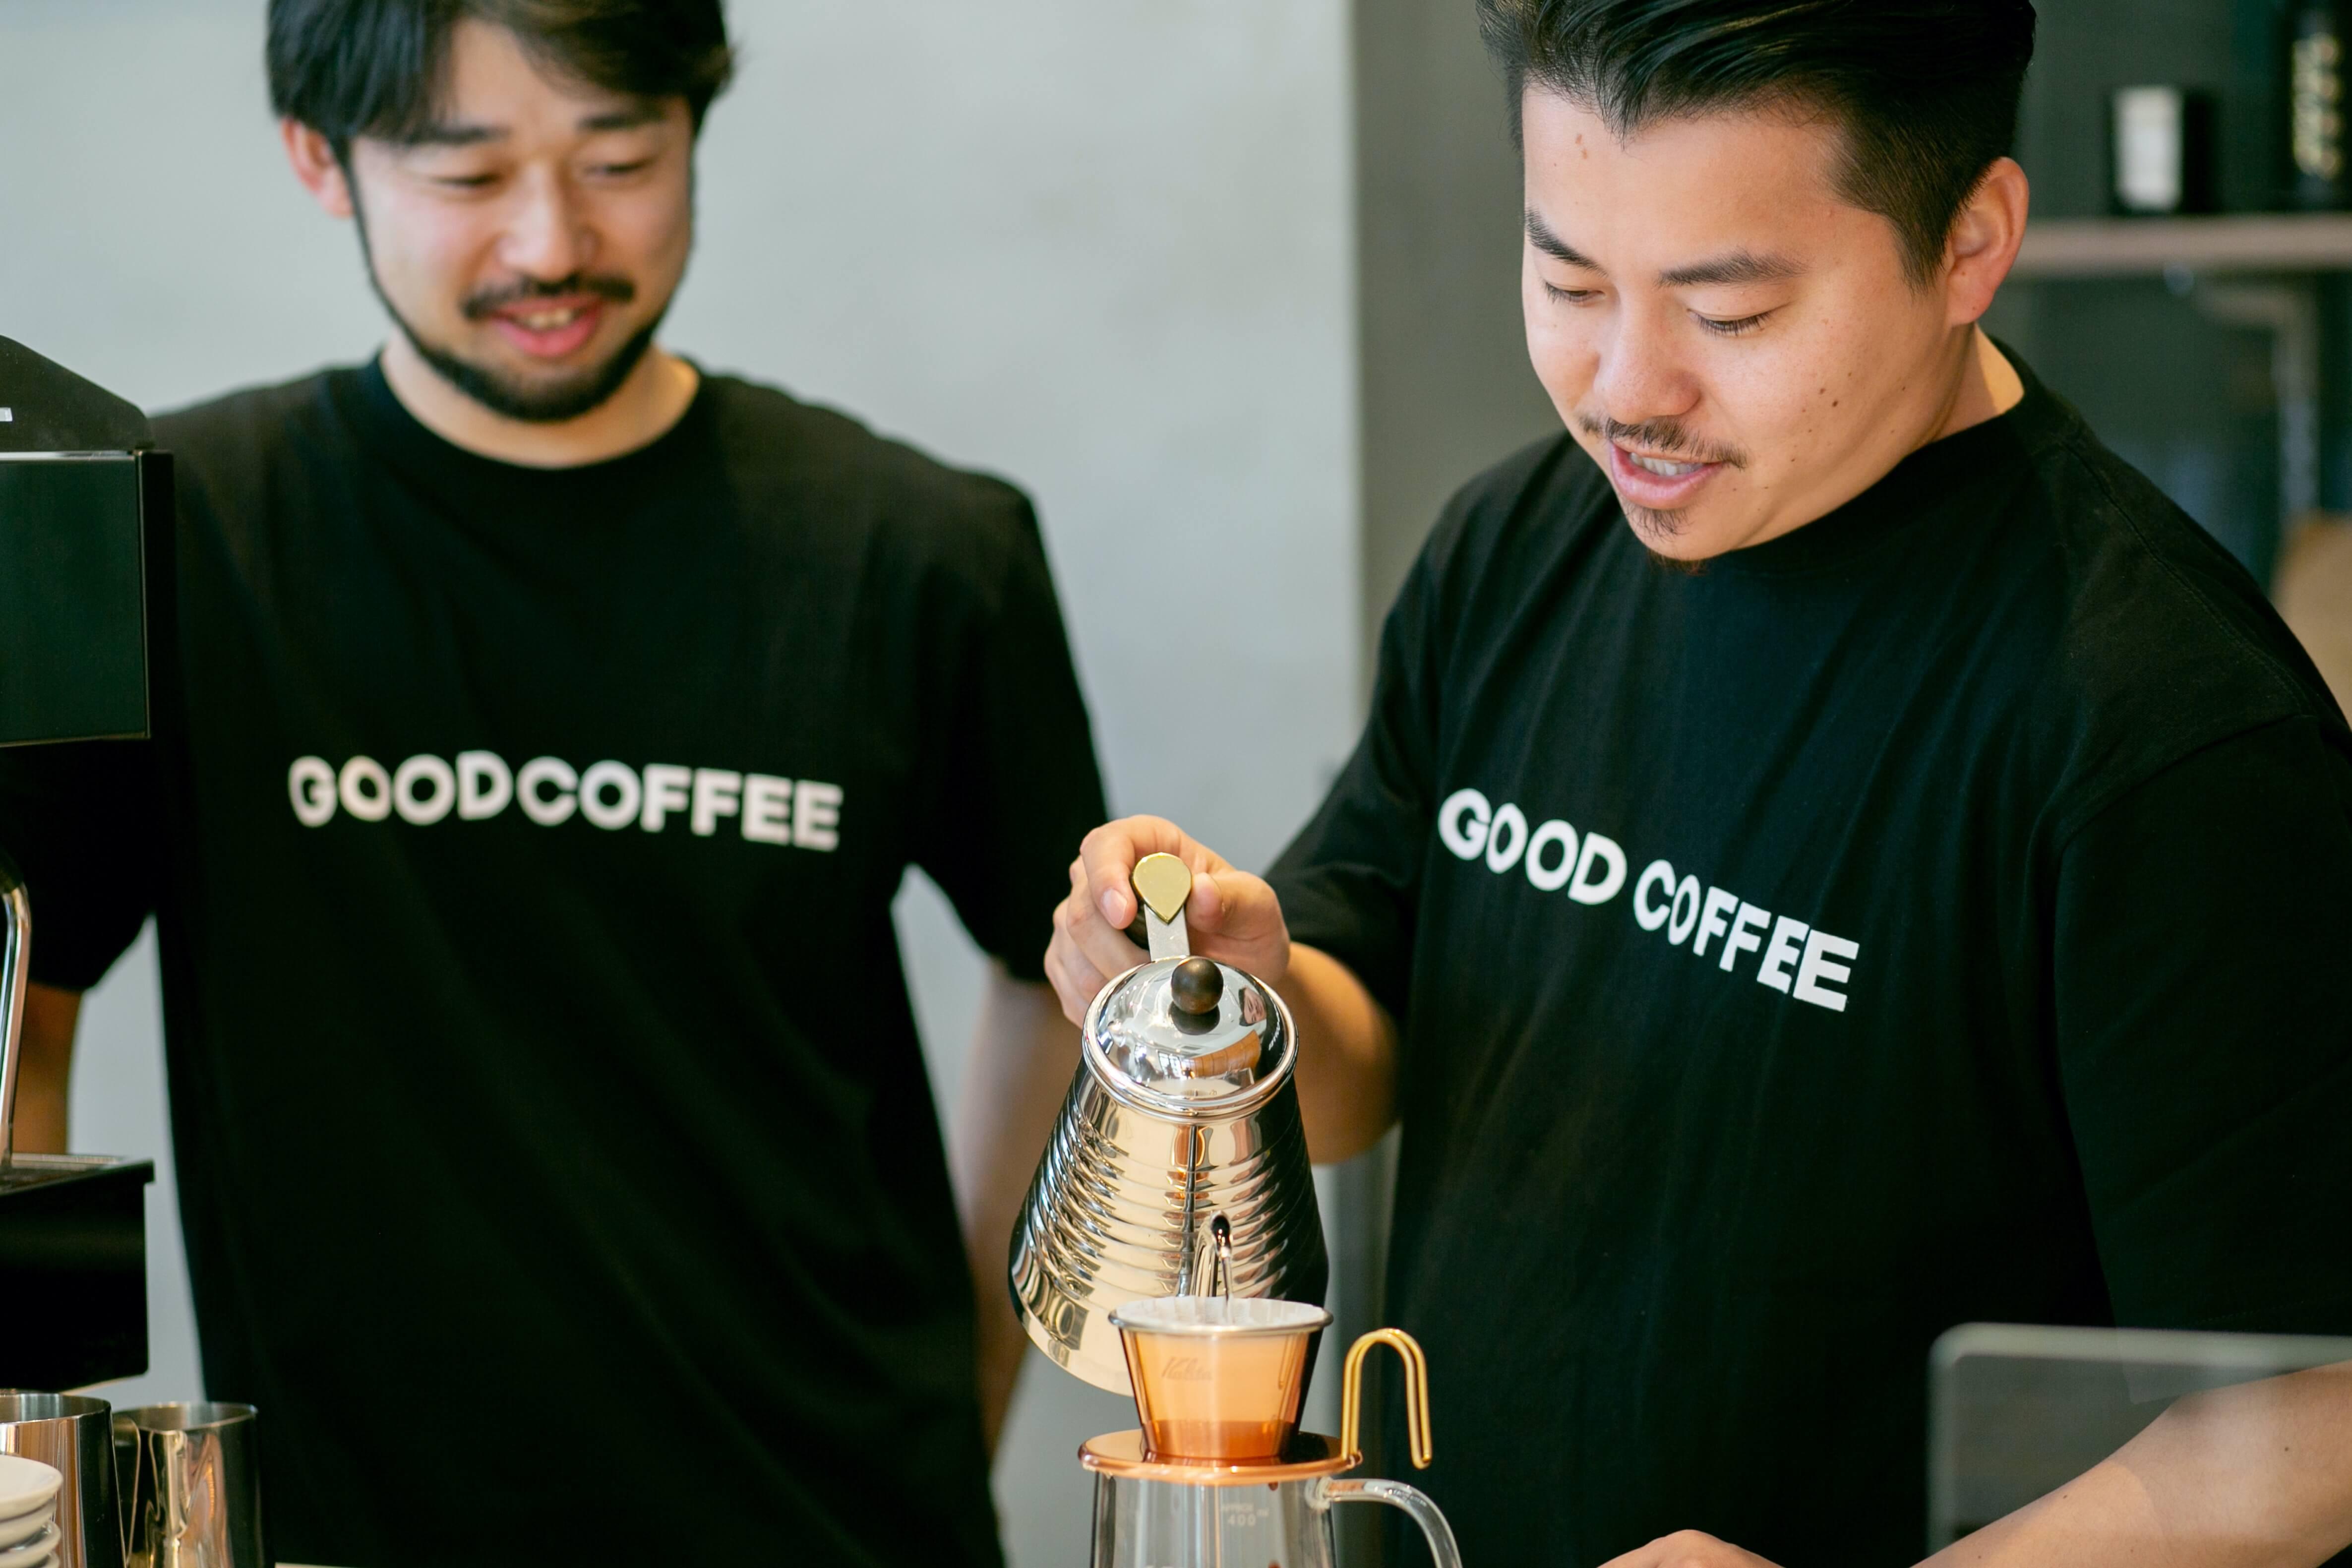 the-local-coffee-stand-fukuoka-%e3%82%b3%e3%83%bc%e3%83%92%e3%83%bc%e3%82%b9%e3%82%bf%e3%83%b3%e3%83%89-%e7%a6%8f%e5%b2%a1-%e5%92%96%e5%95%a1%e7%a6%8f%e5%b2%a1_2-2